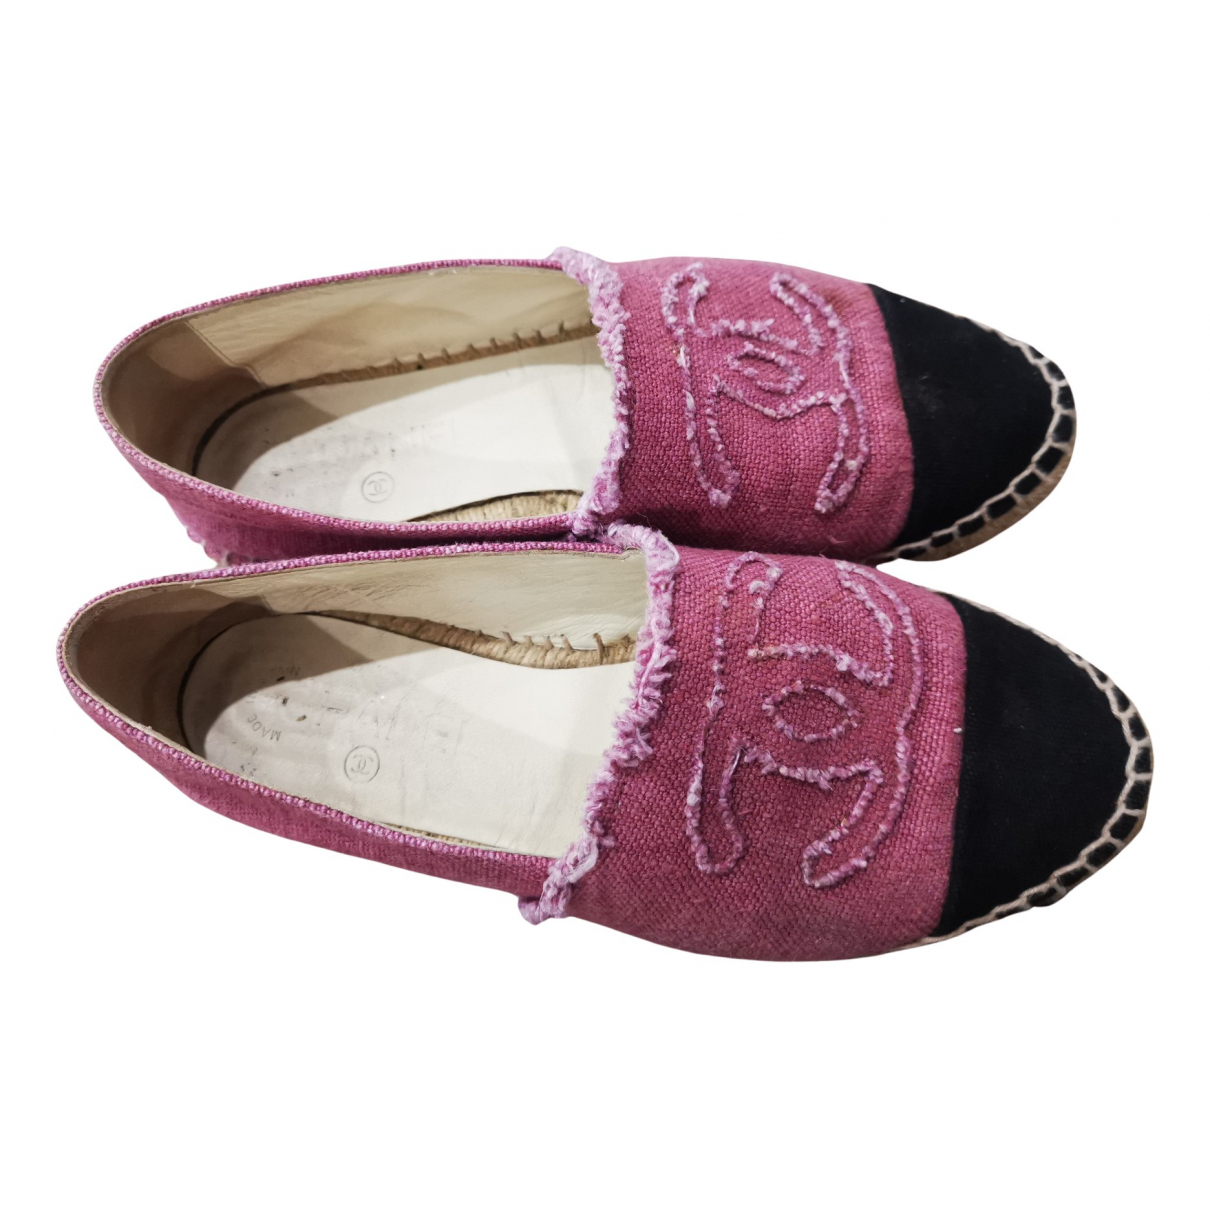 Chanel \N Espadrilles in  Rosa Denim - Jeans